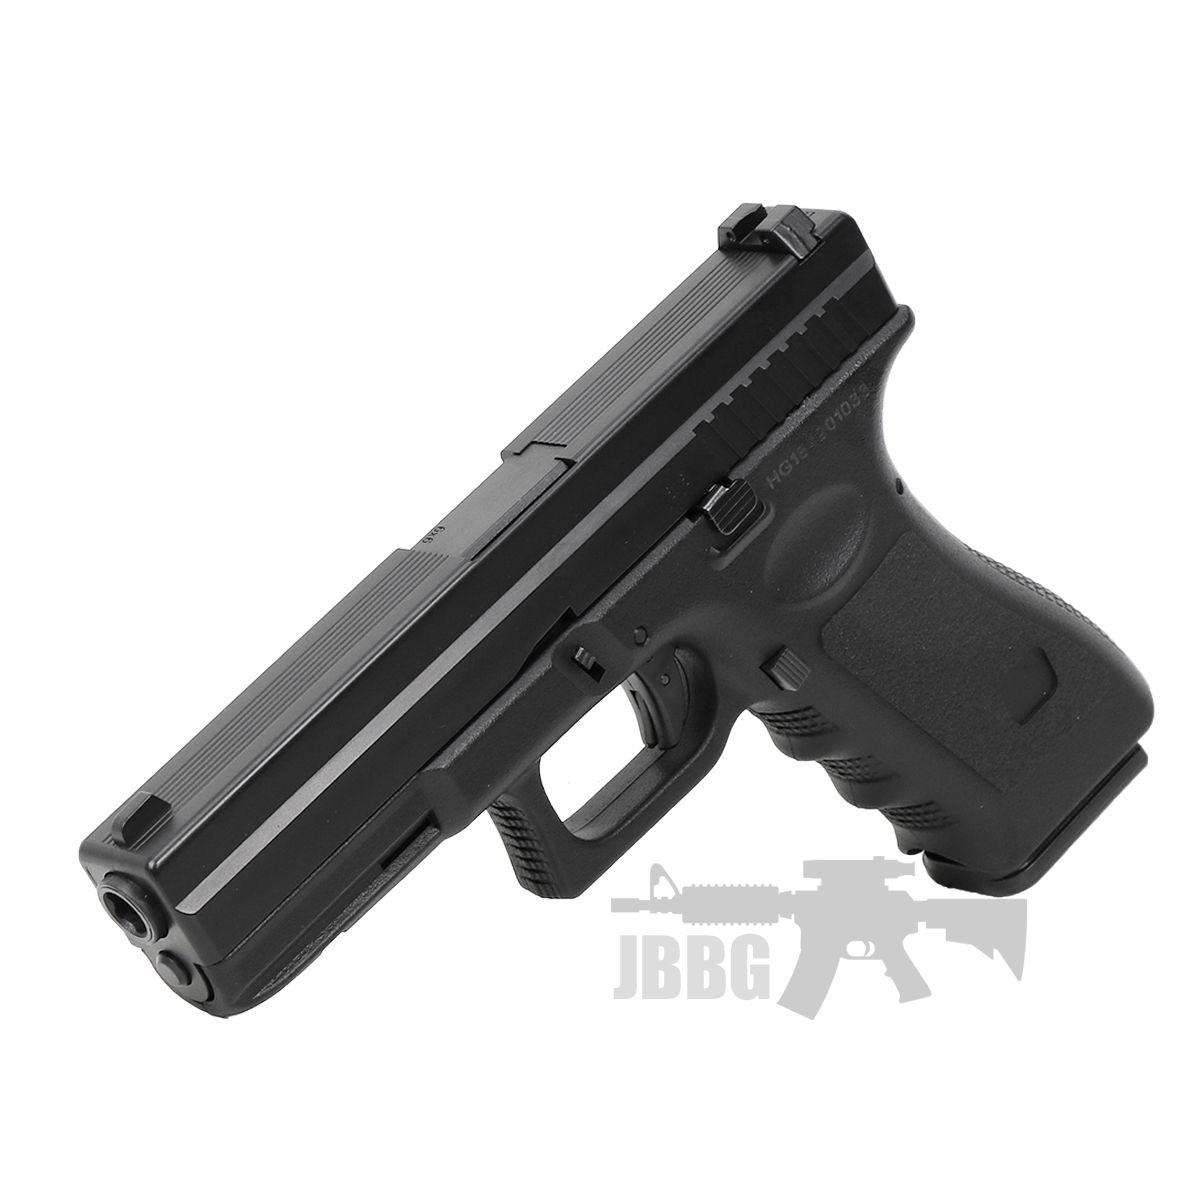 hg184 airsoft bb pistol 4